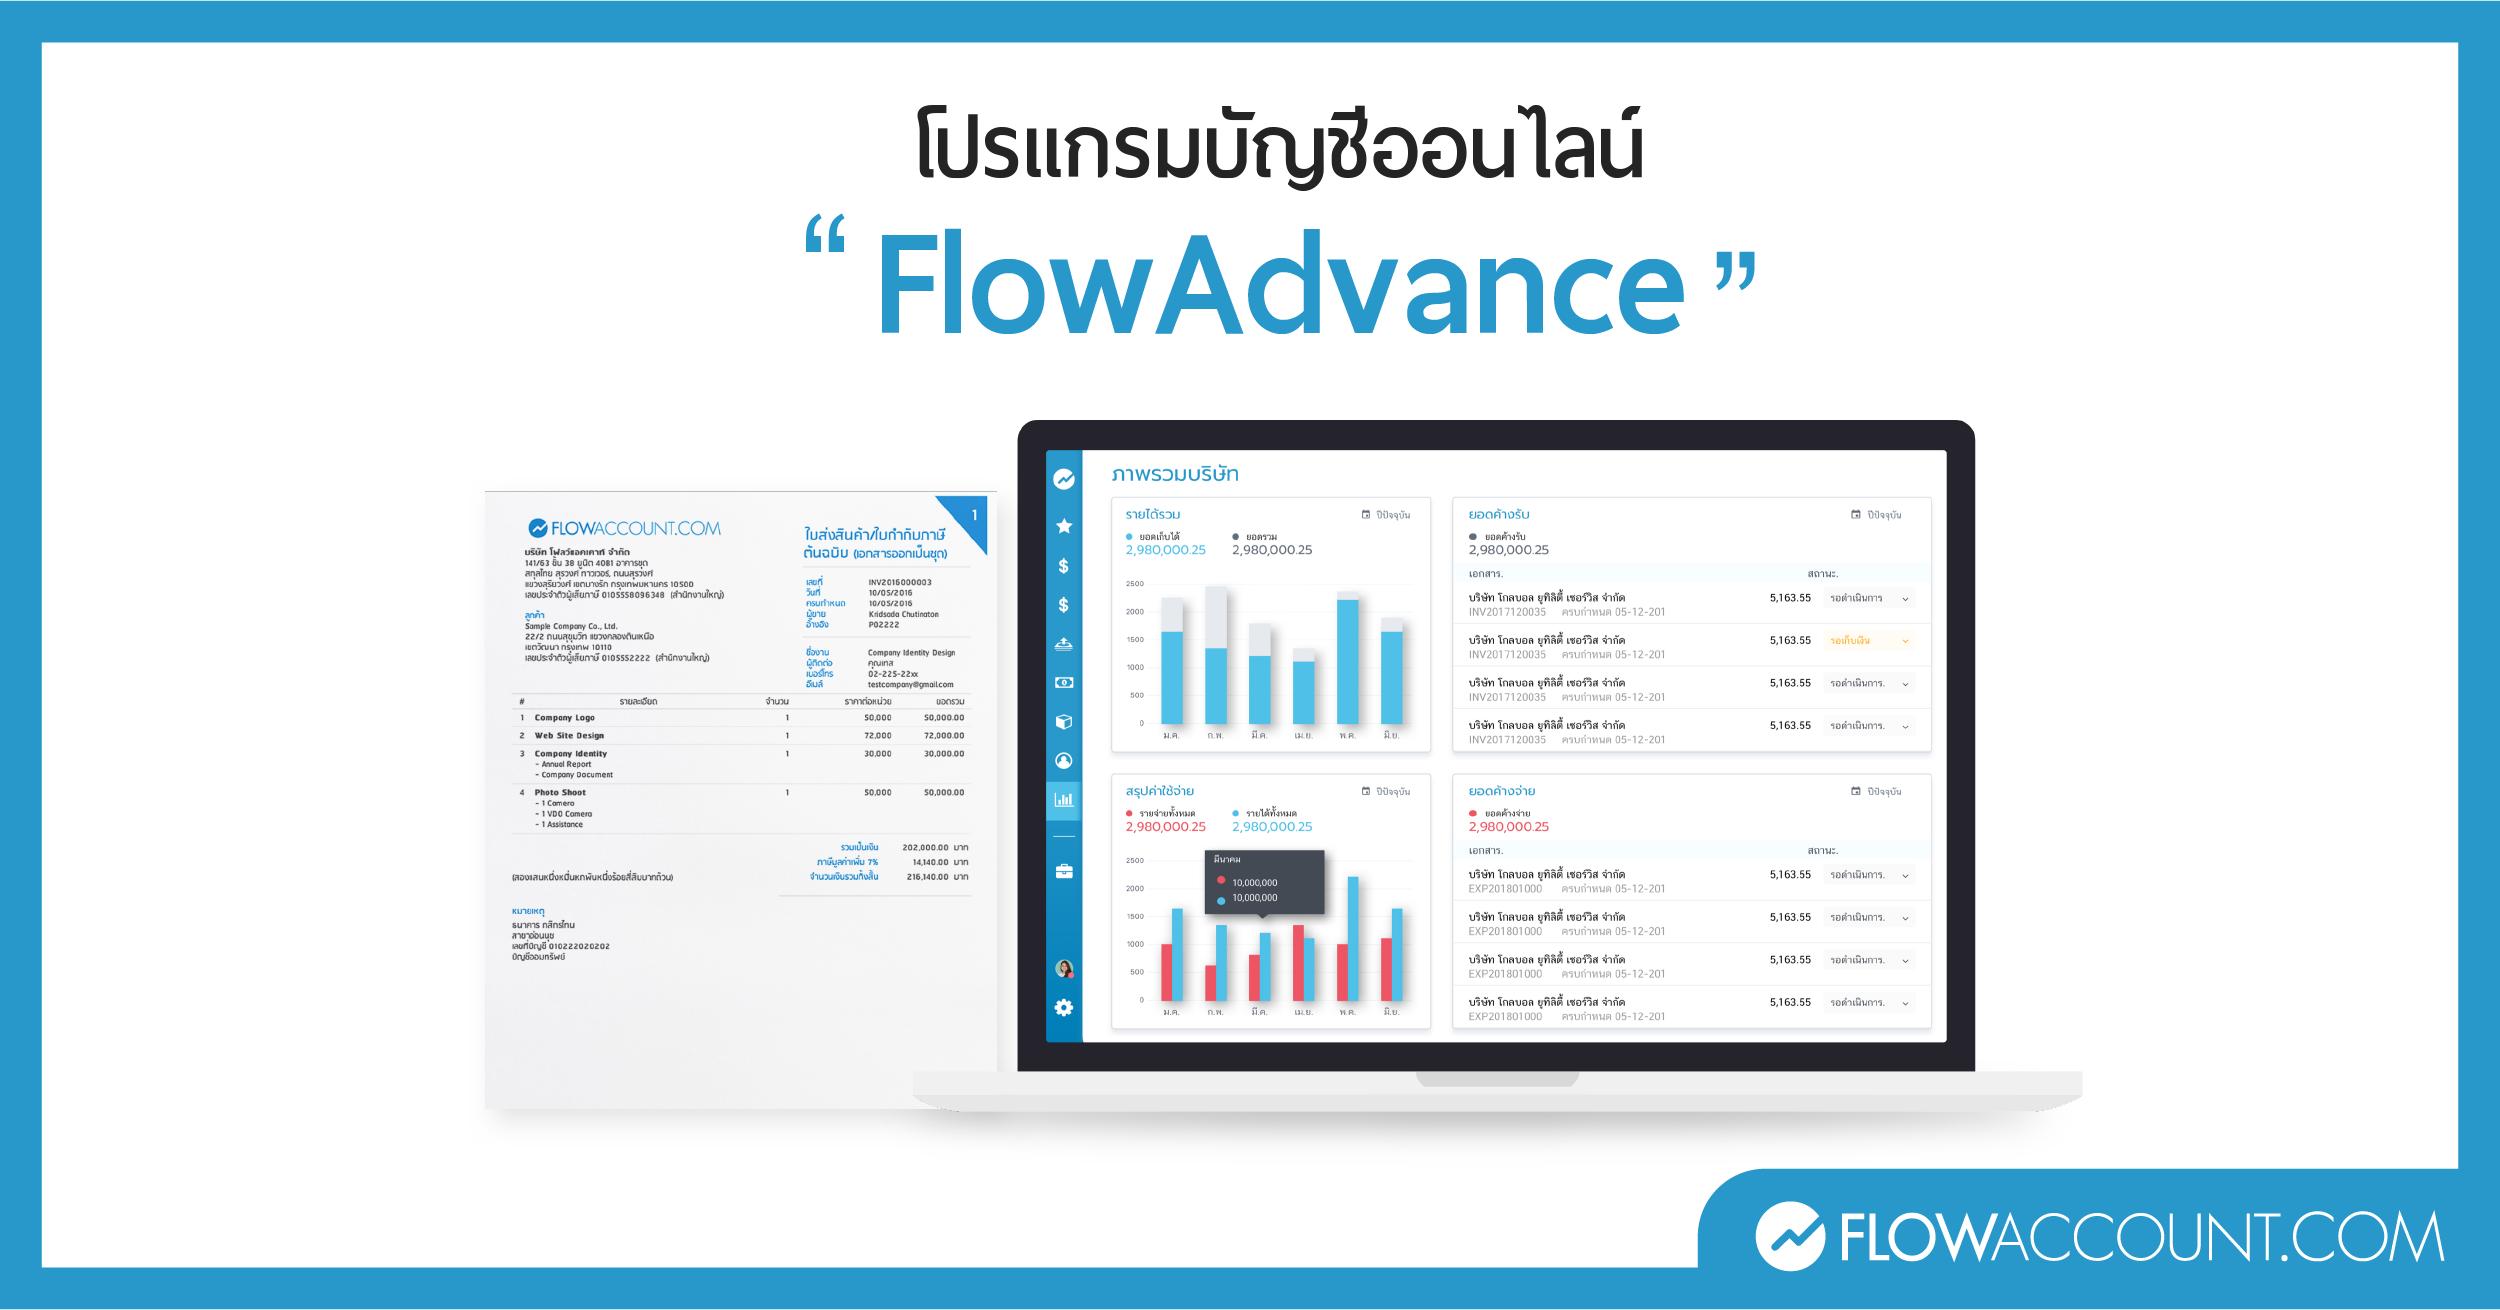 FlowAdvance โปรแกรมบัญชีออนไลน์